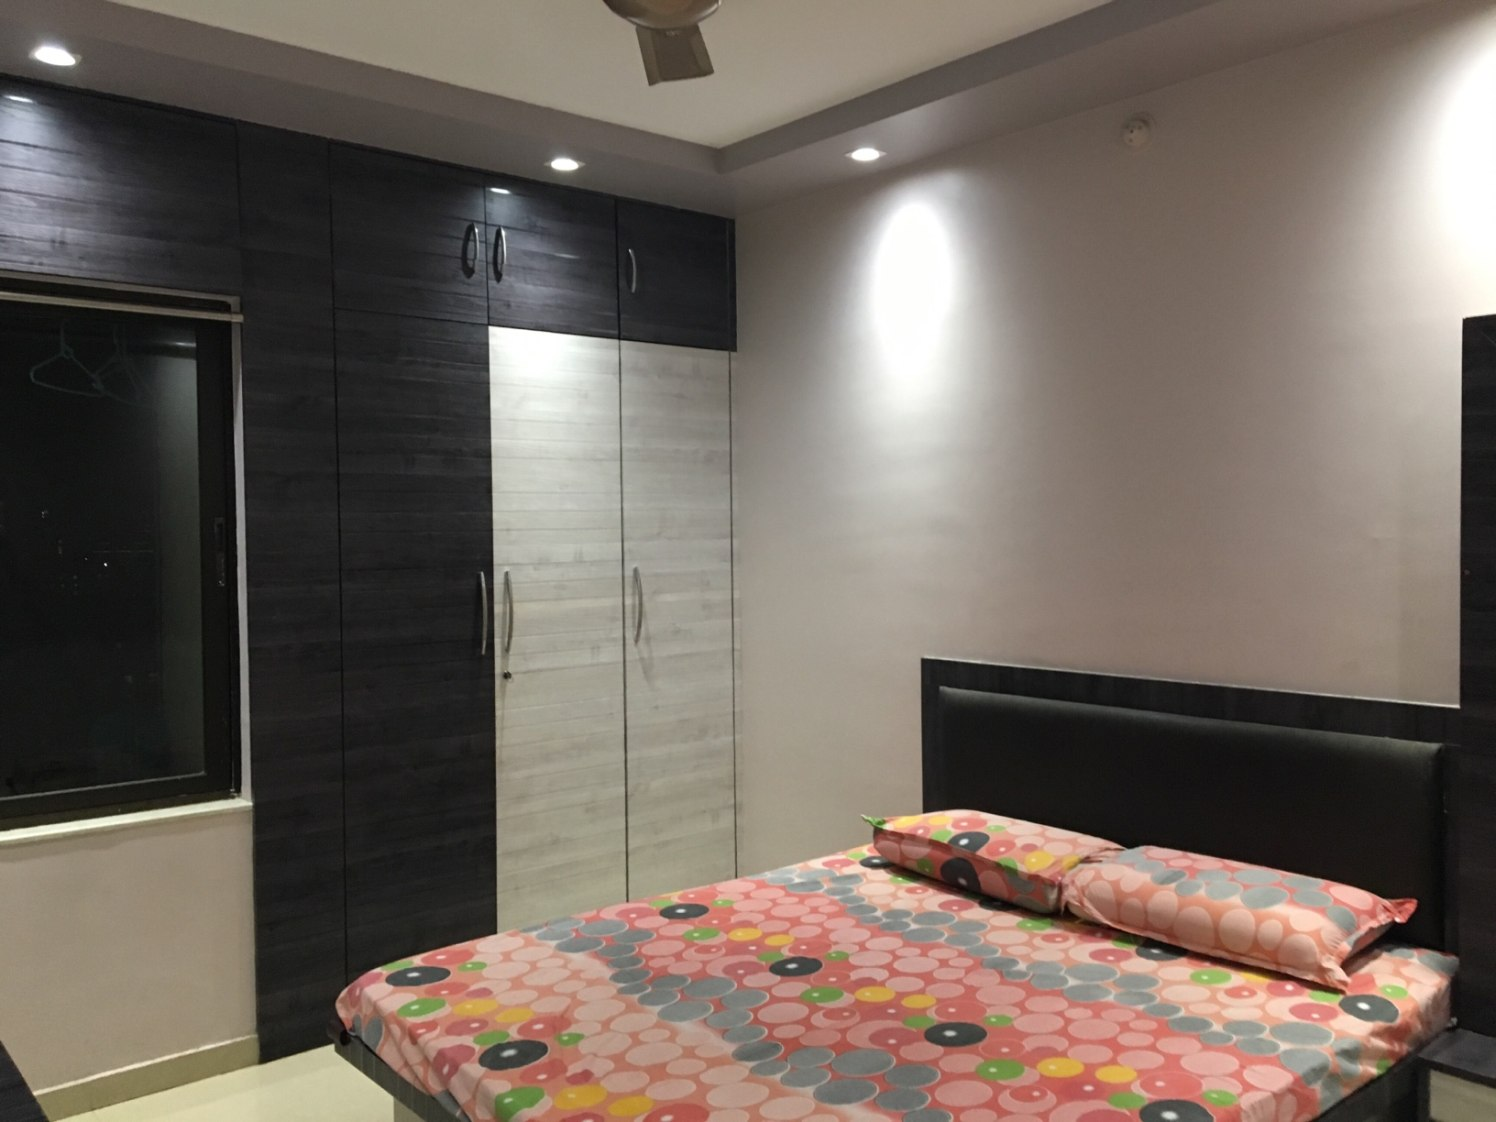 Bedroom With Mounted Wooden Wardrobe by Kalyani Kulkarni Bedroom Contemporary   Interior Design Photos & Ideas